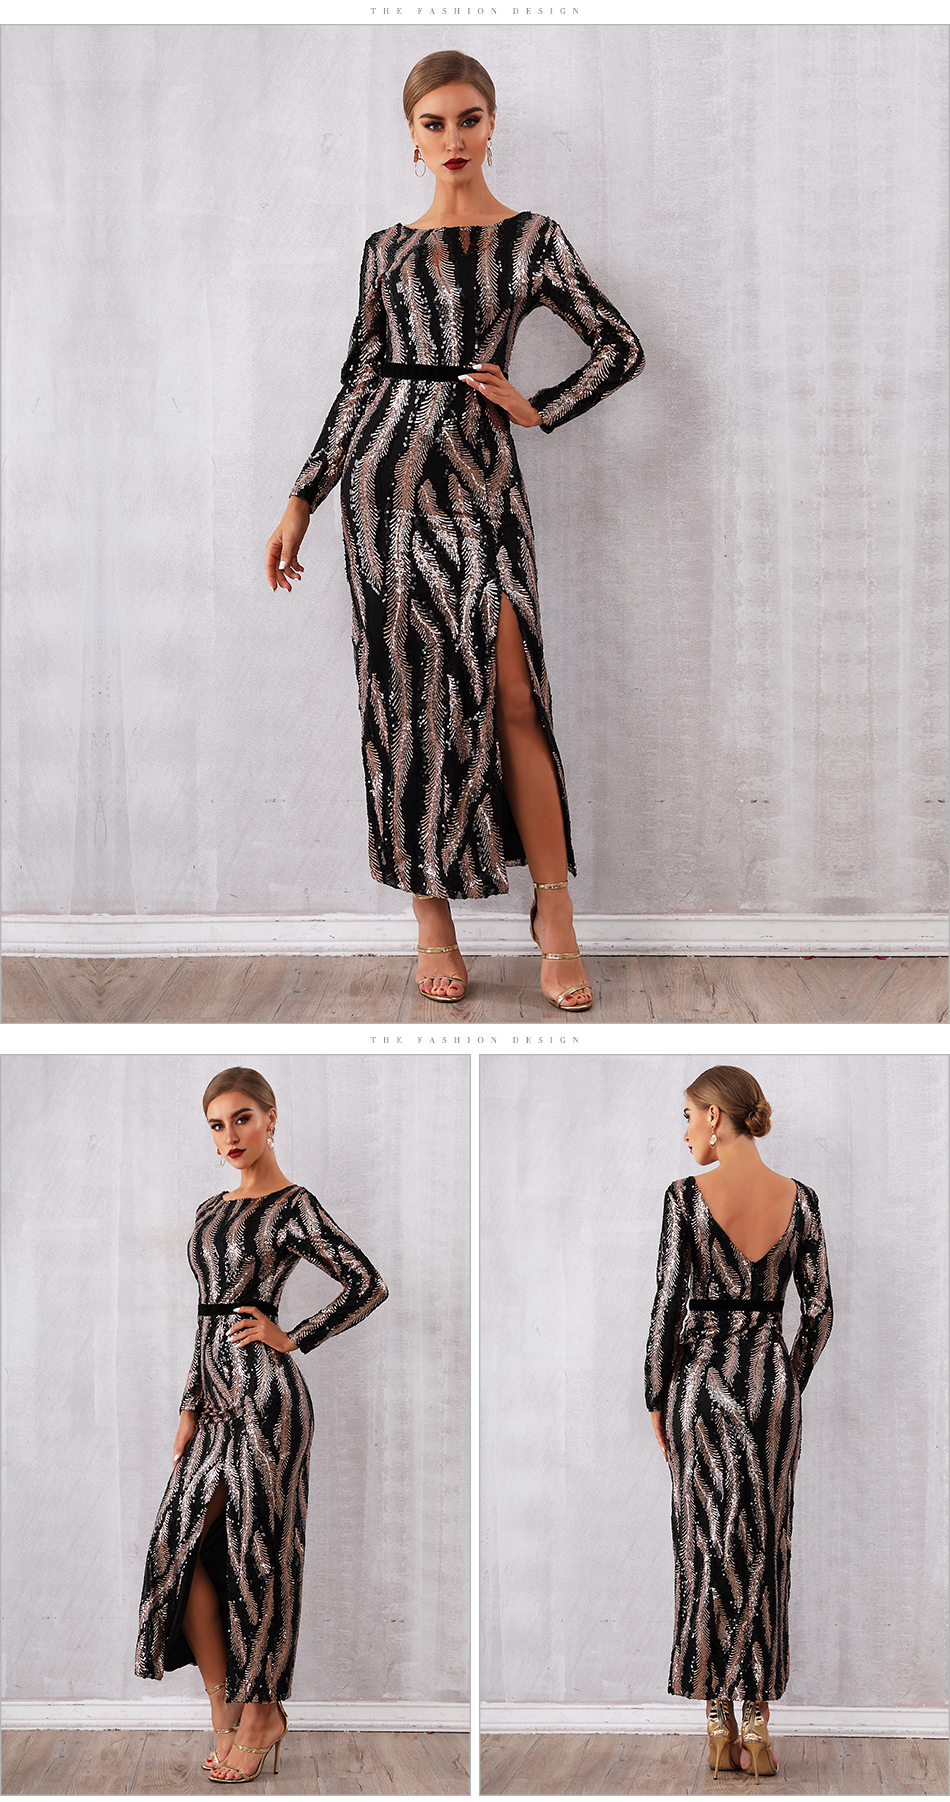 1c83655b59fe7 Adyce 2019 New Spring Celebrity Party Dress Sequined Women Dress Vestido  Sexy Deep V Neck Maxi Backless Long Sleeve Club Dresses